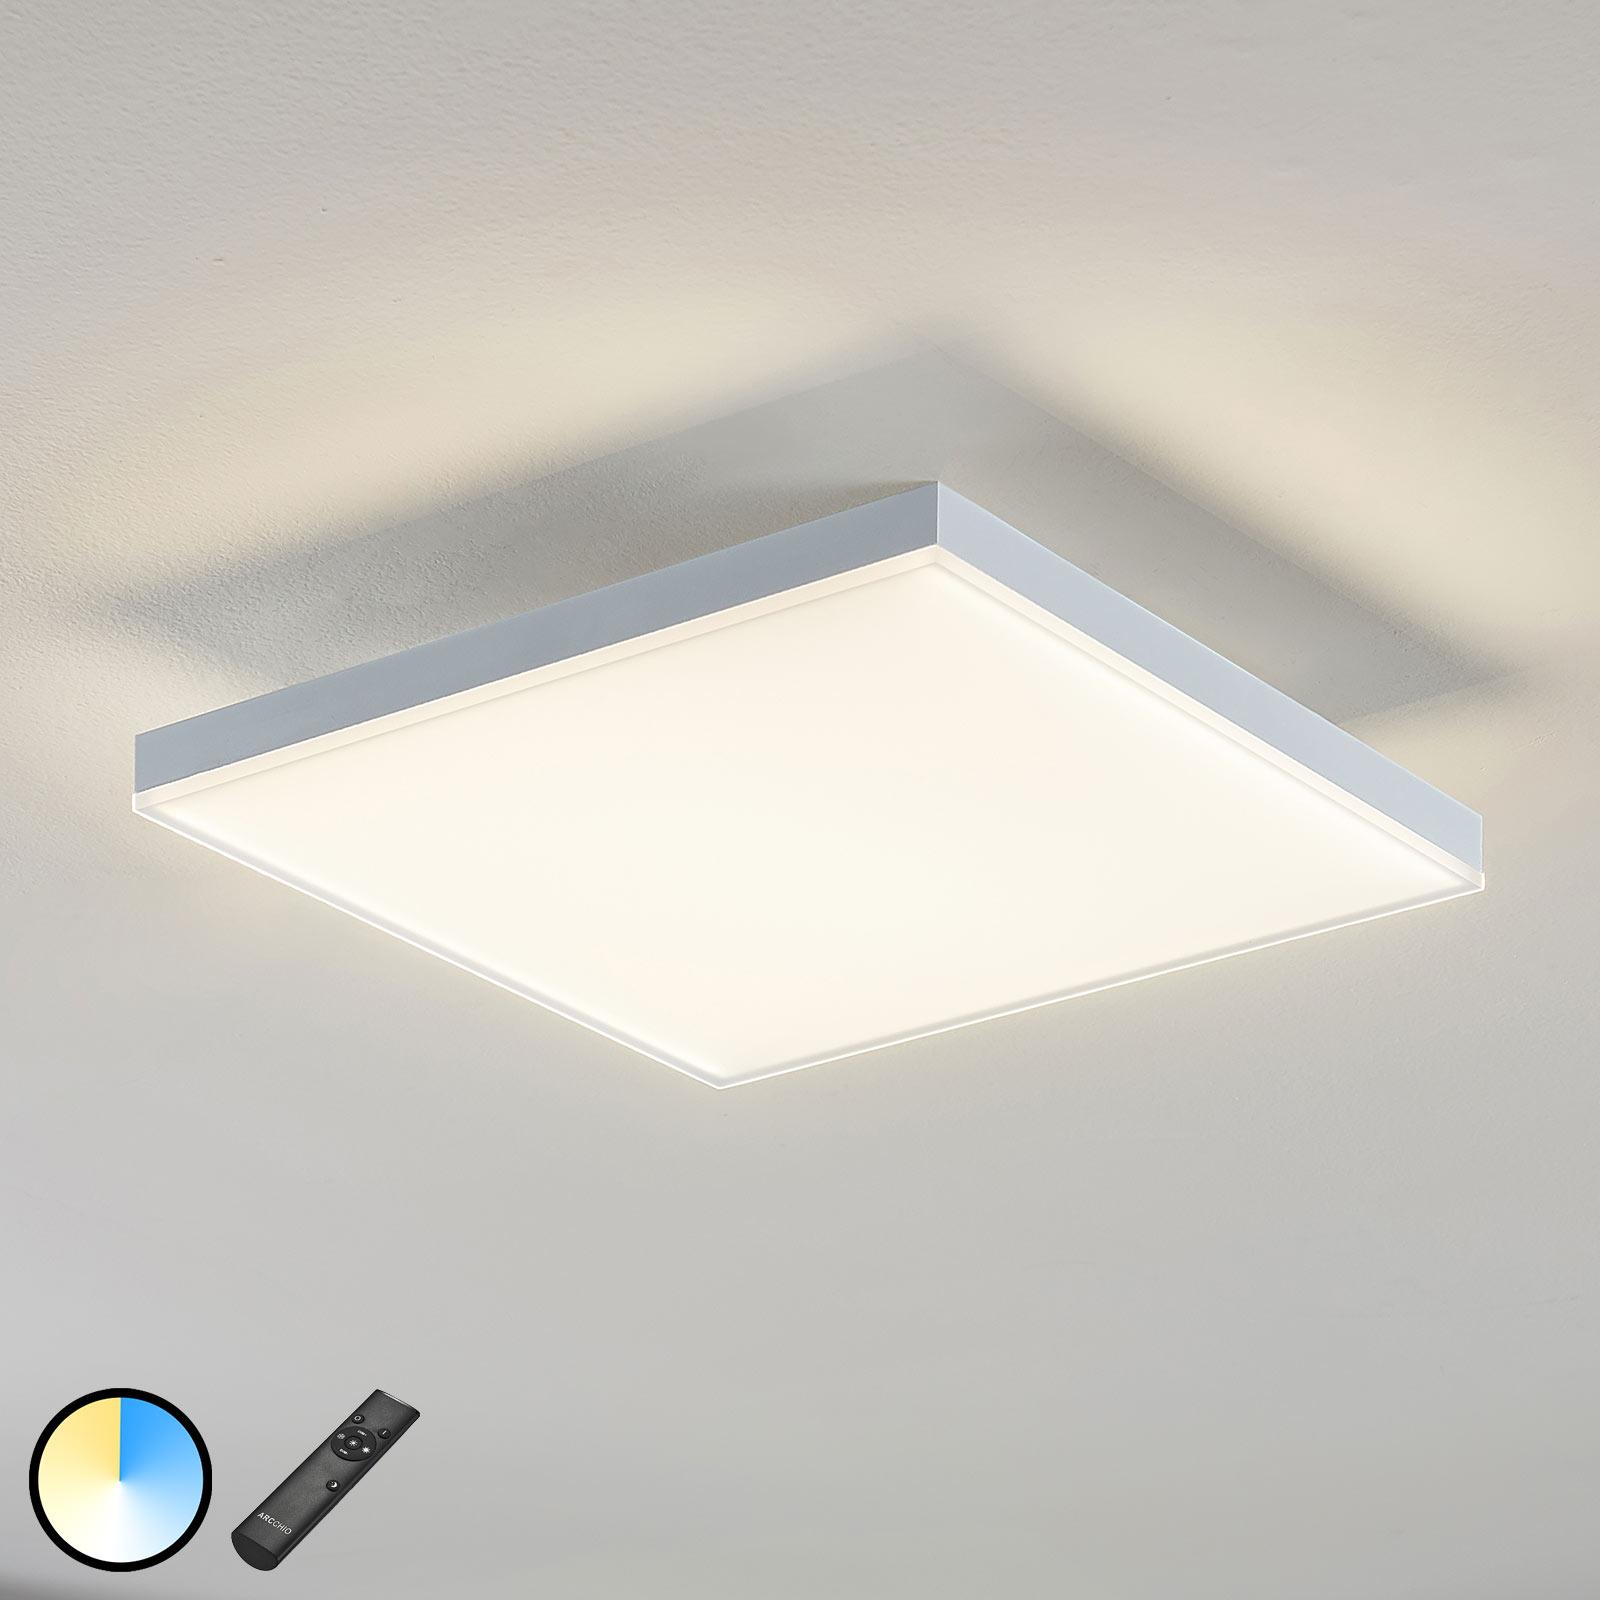 Pannello LED Blaan CCT telecomando 29,5 x 29,5cm